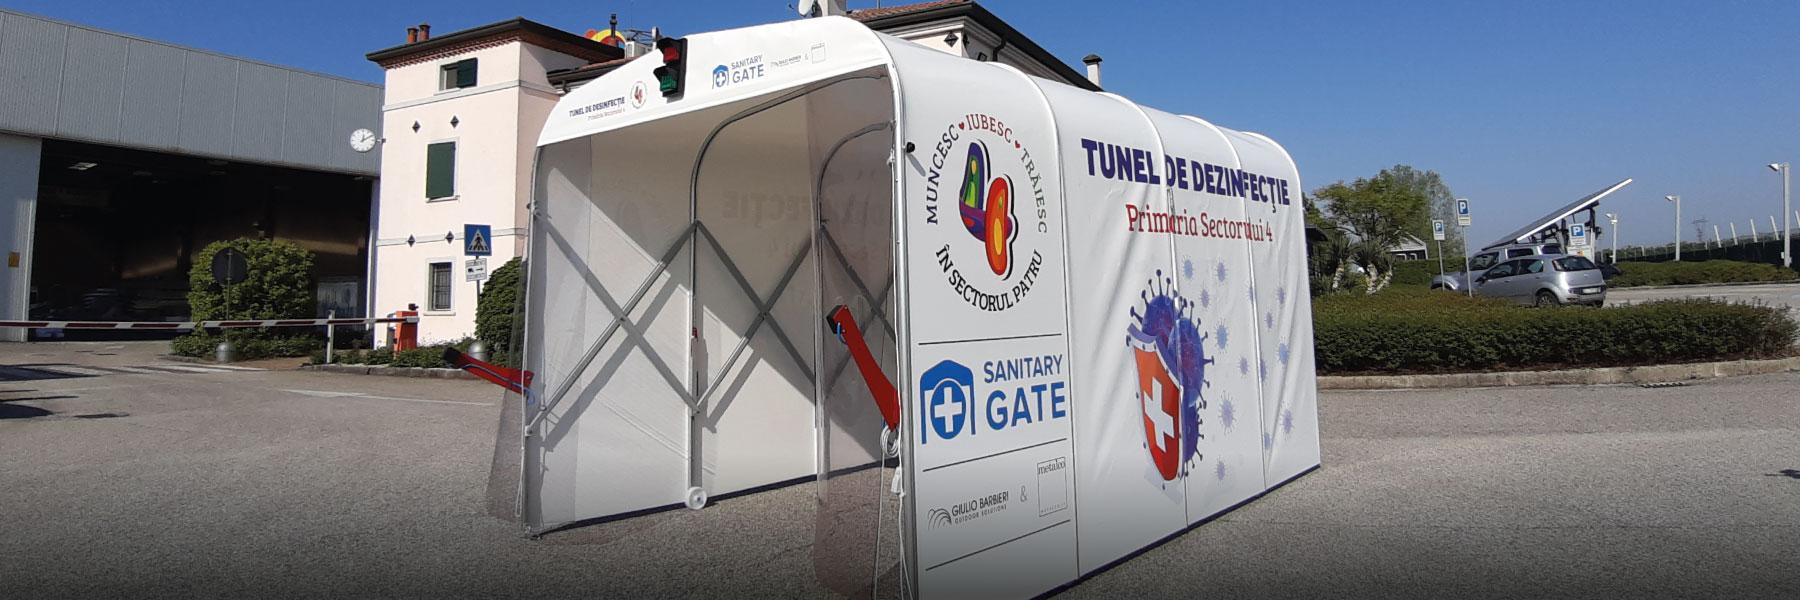 SANITARY GATE - TUNNEL ADAPTE À L'ASSAINISSEMENT